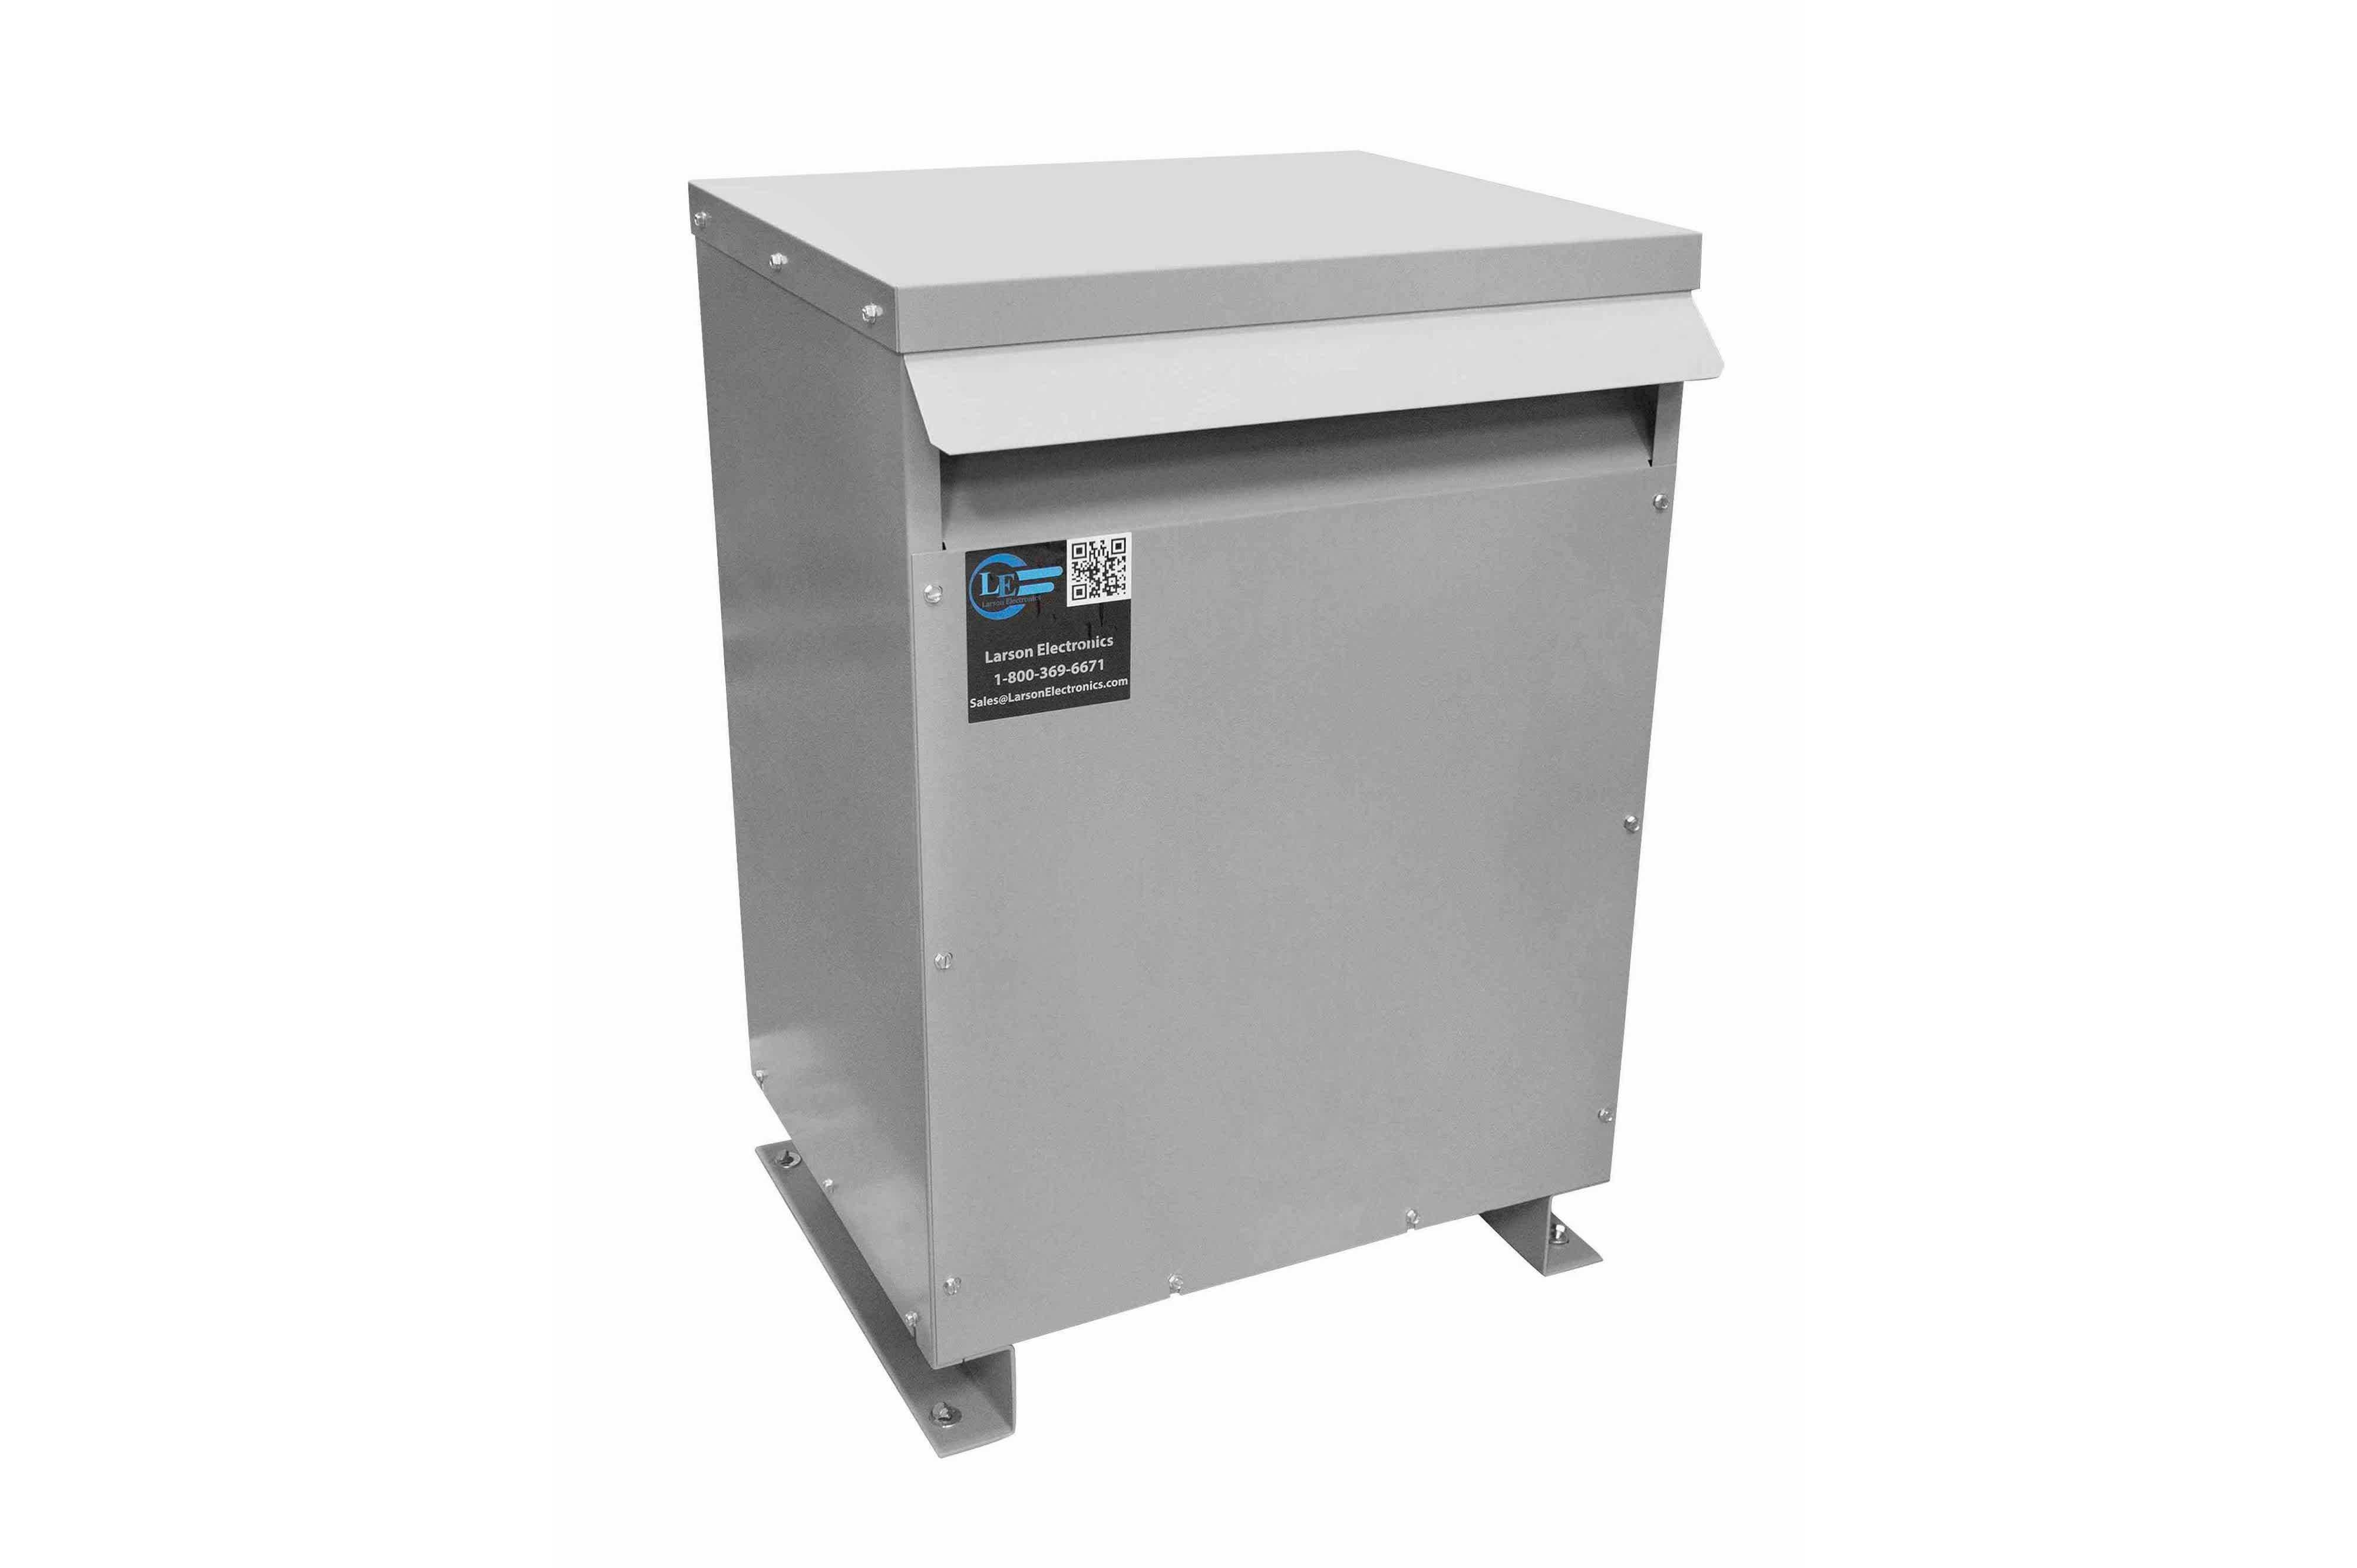 80 kVA 3PH Isolation Transformer, 415V Wye Primary, 208Y/120 Wye-N Secondary, N3R, Ventilated, 60 Hz